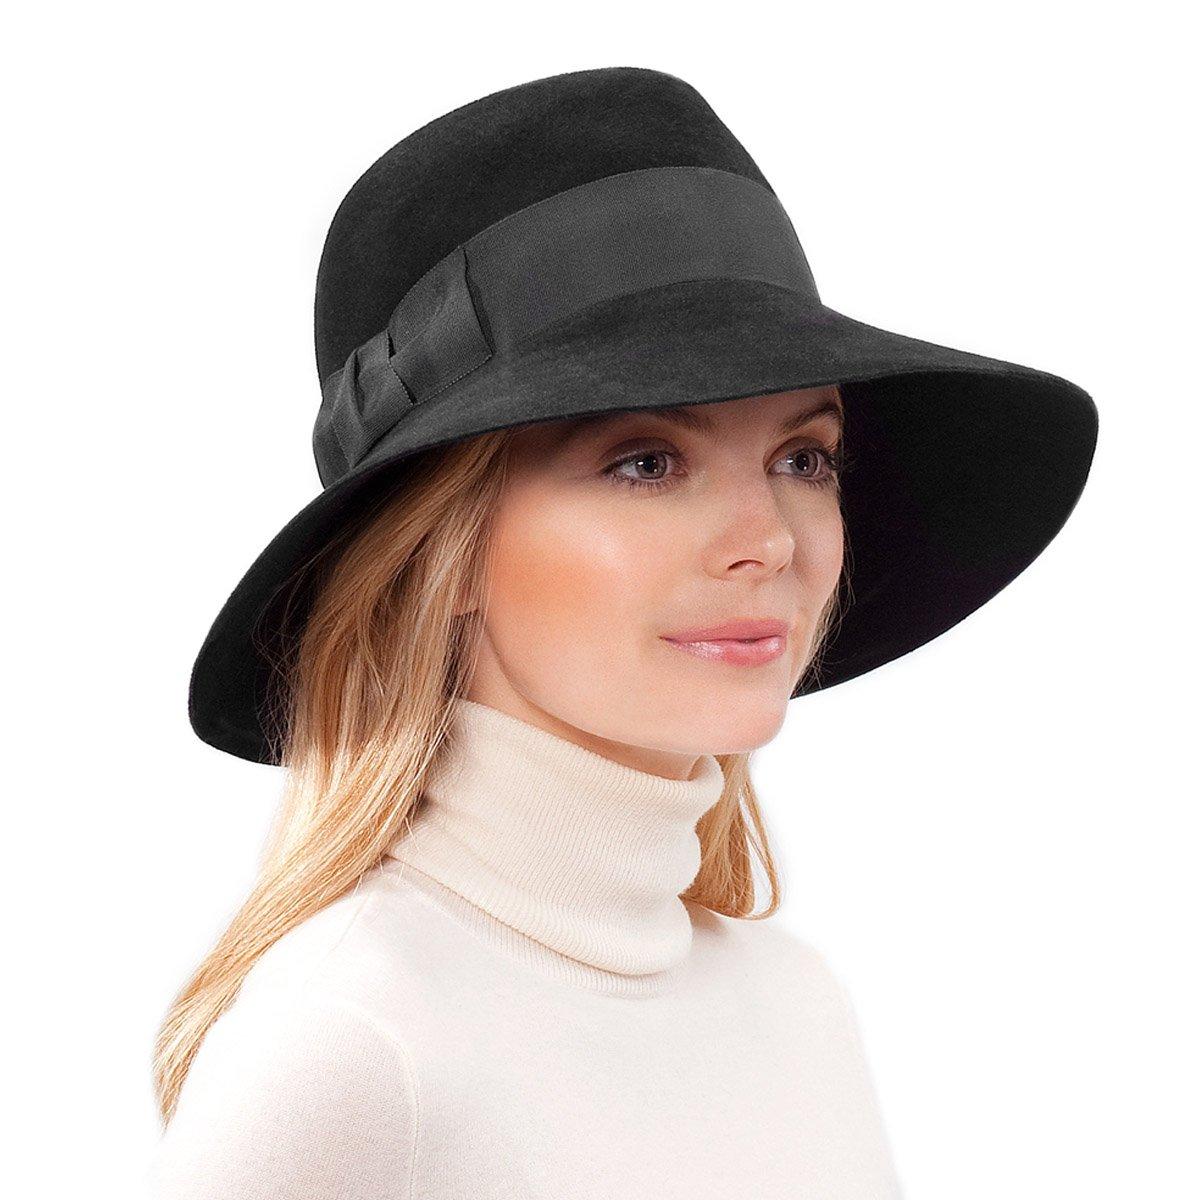 Eric Javits Luxury Fashion Designer Women's Headwear Hat - Tiffany - Black